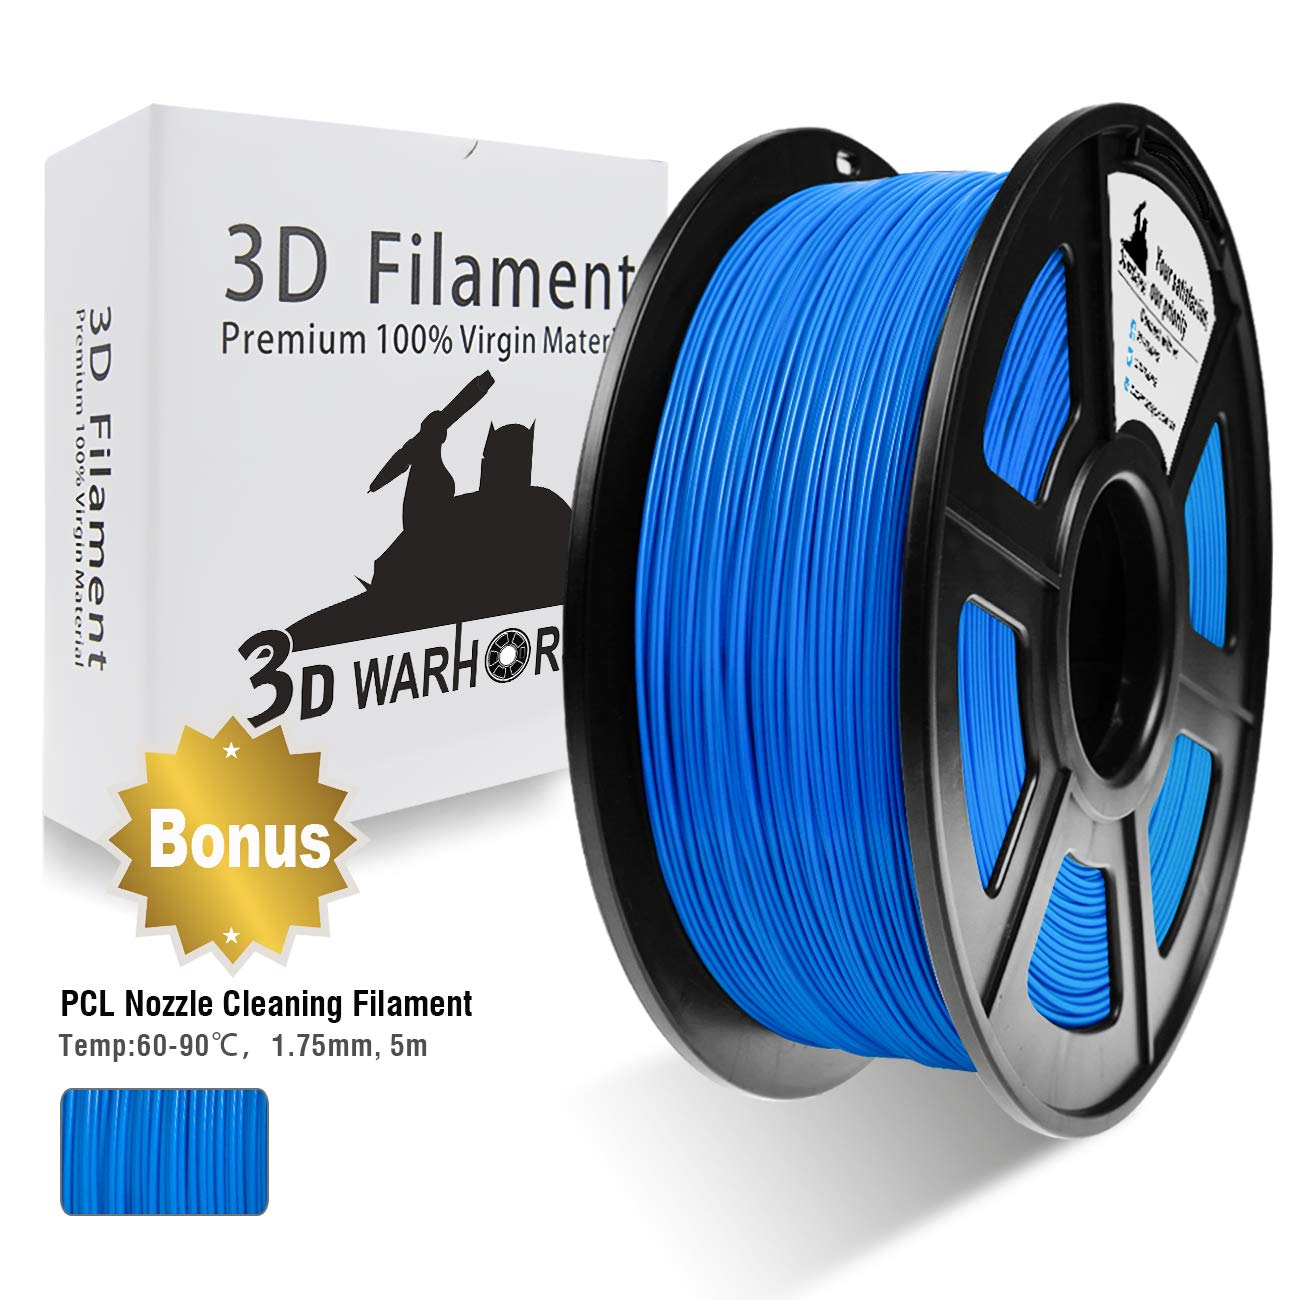 Dimensional Accuracy +//- 0.02 mm 1KG ,1.75mm Filament 2.2 LBS PLA Filament Black 3D Hero PLA Filament 1.75mm,PLA 3D Printer Filament Bonus with 5M PCL Nozzle Cleaning Filament